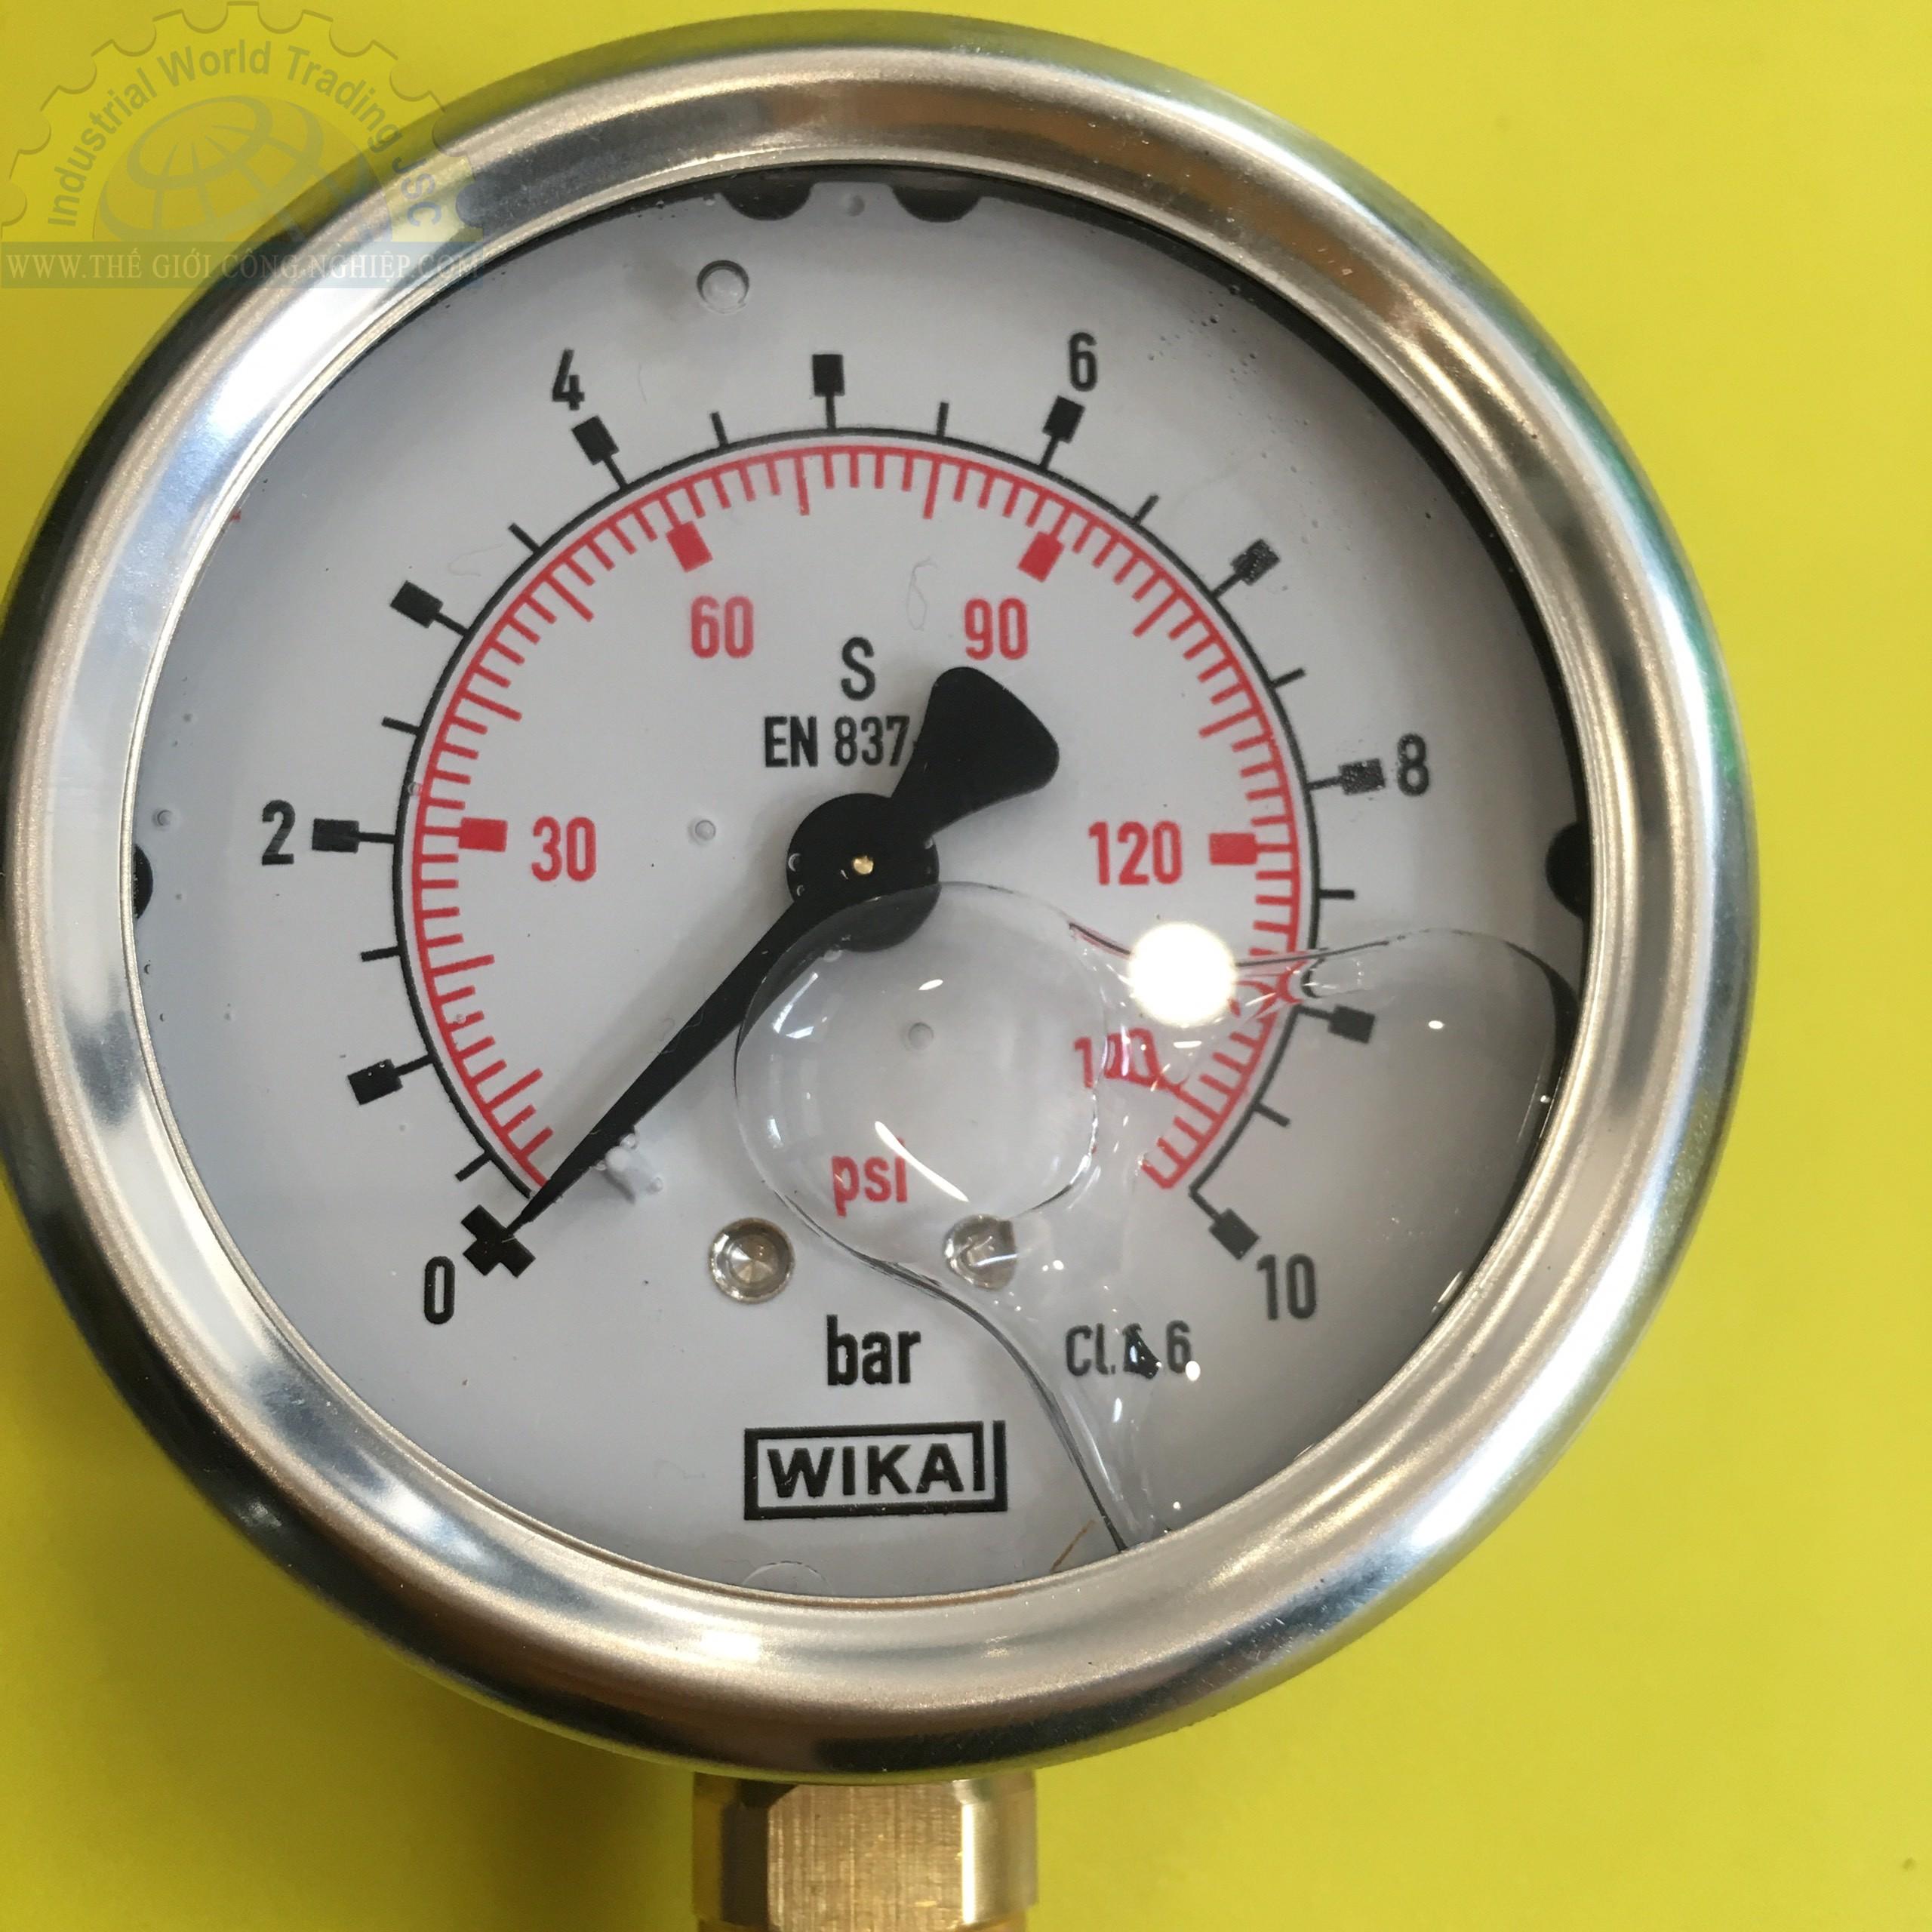 Pressure Gauges 213.53 WIKA